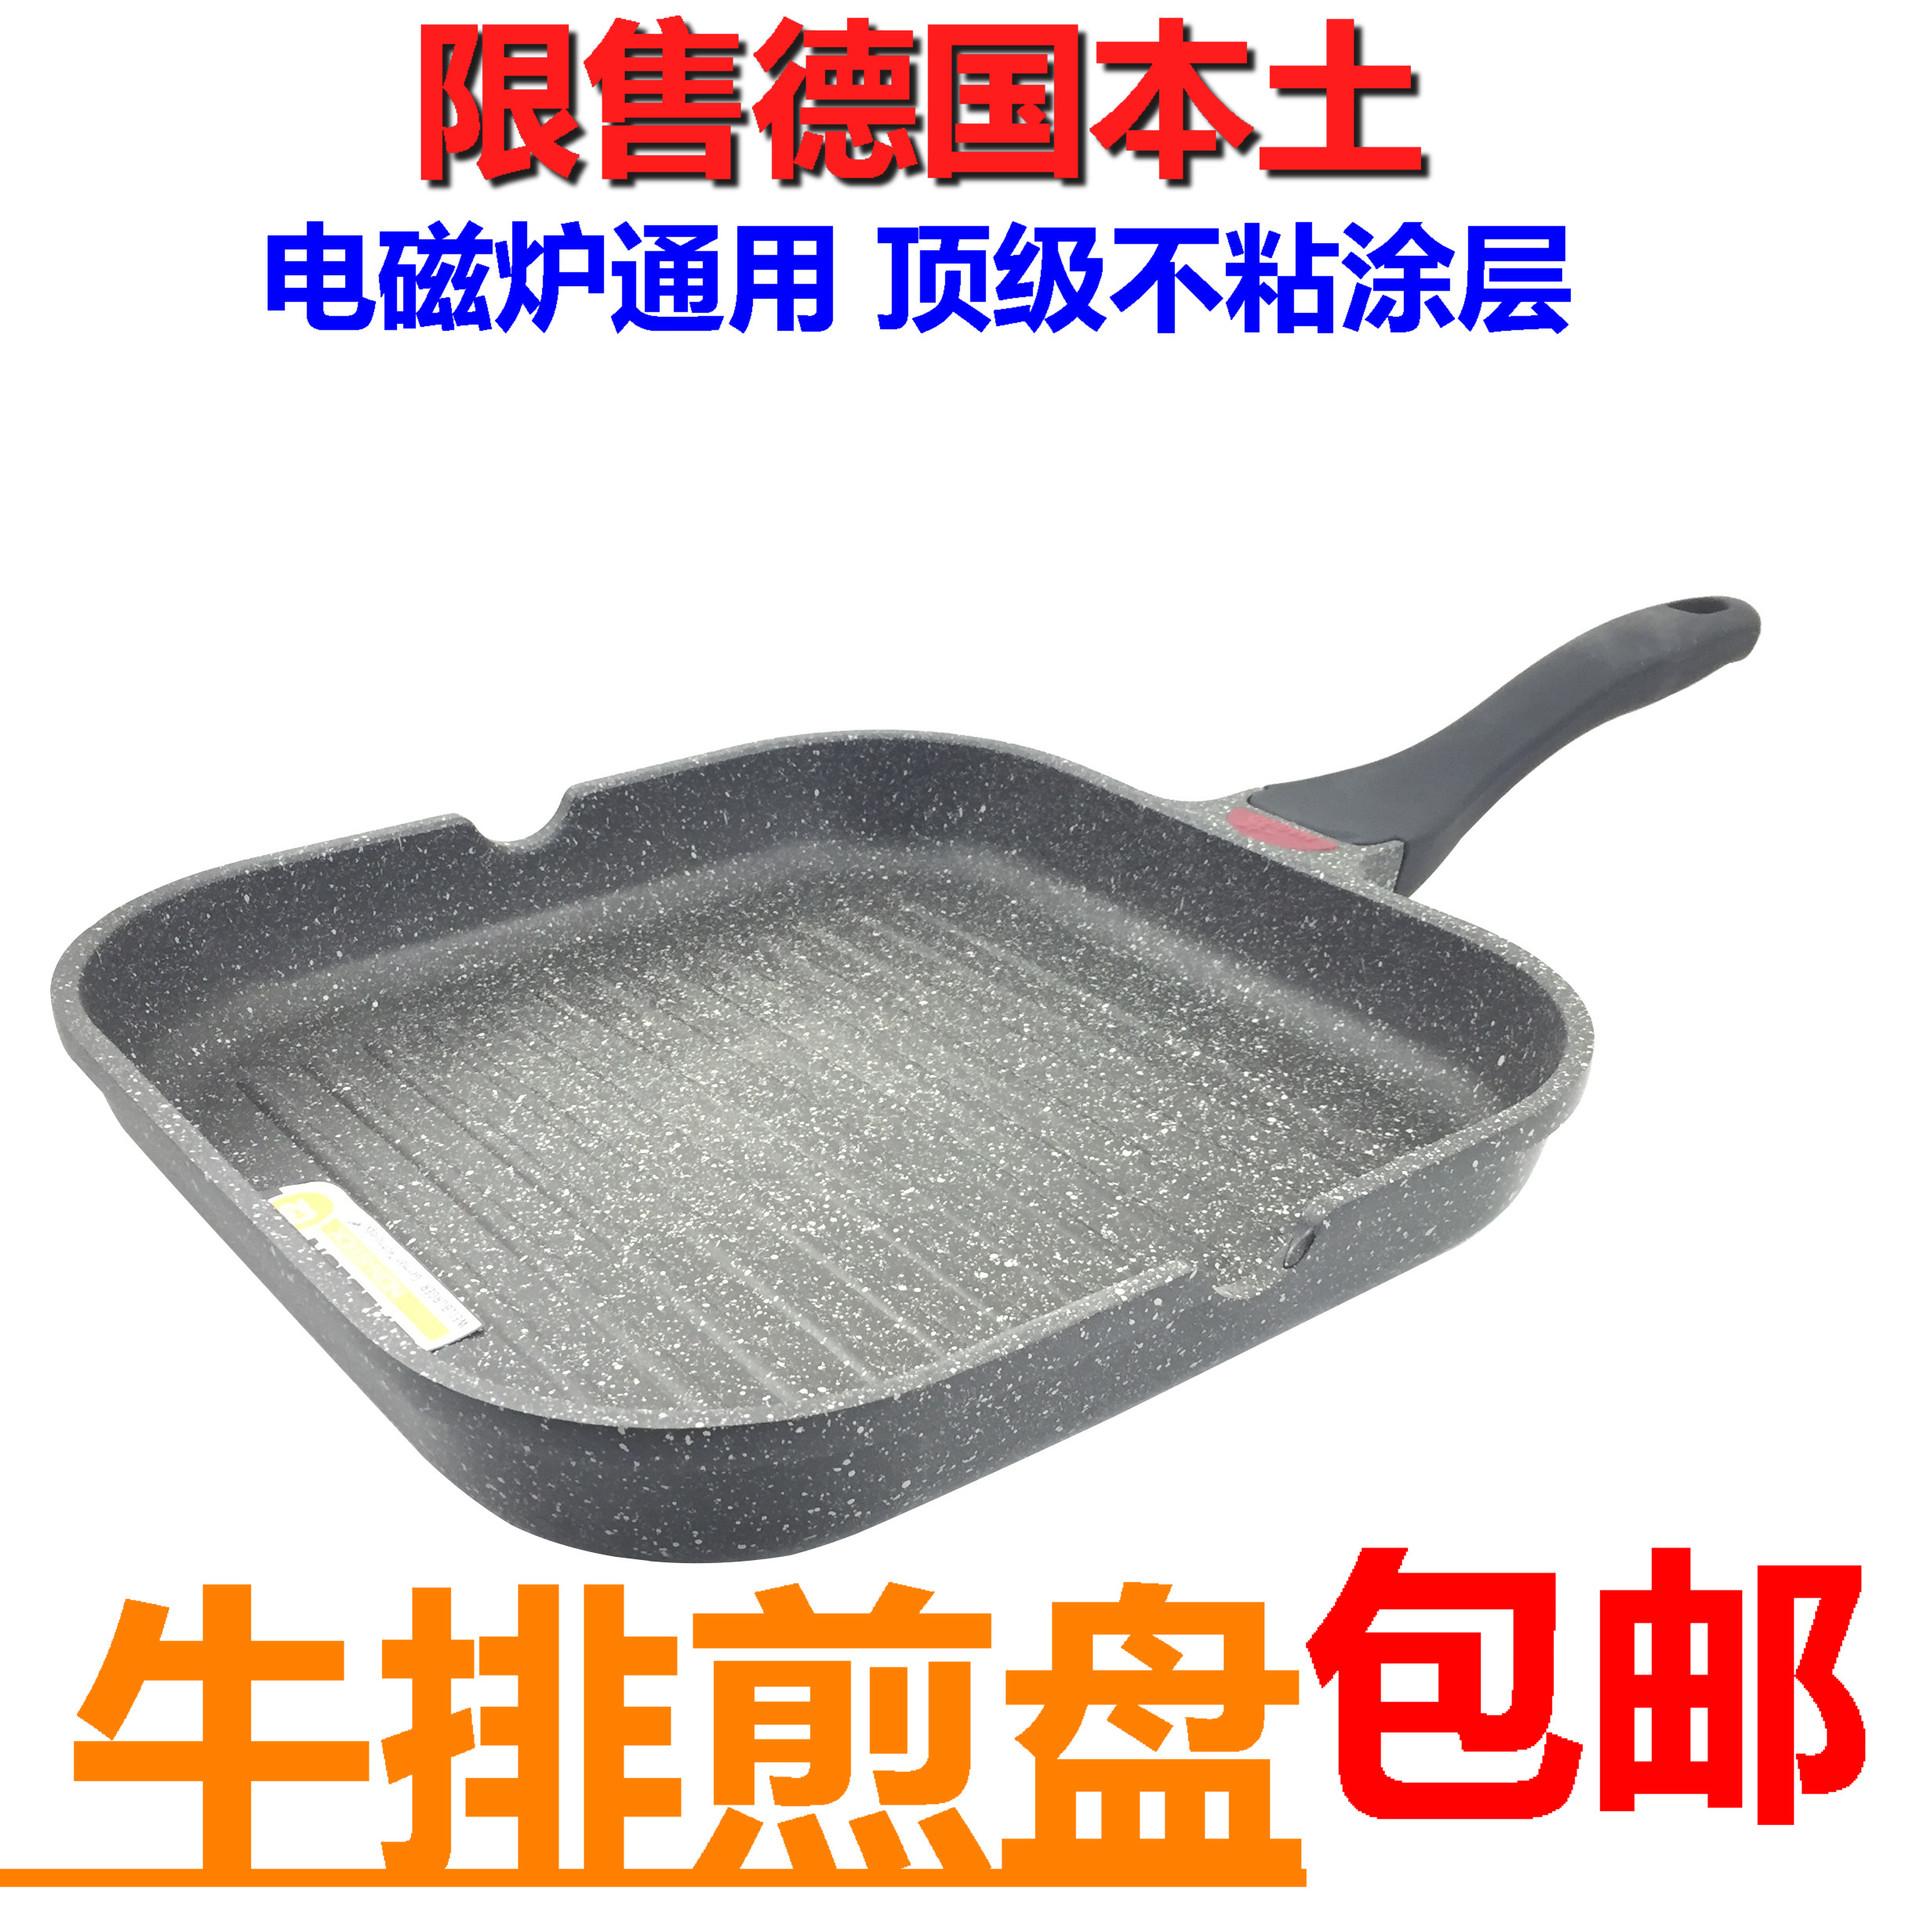 Q Guangzhou IEE La electromagnética horno grill steak plato sartén sin humo antiadherente sartén hogar barbacoa parrilla bandeja(China (Mainland))